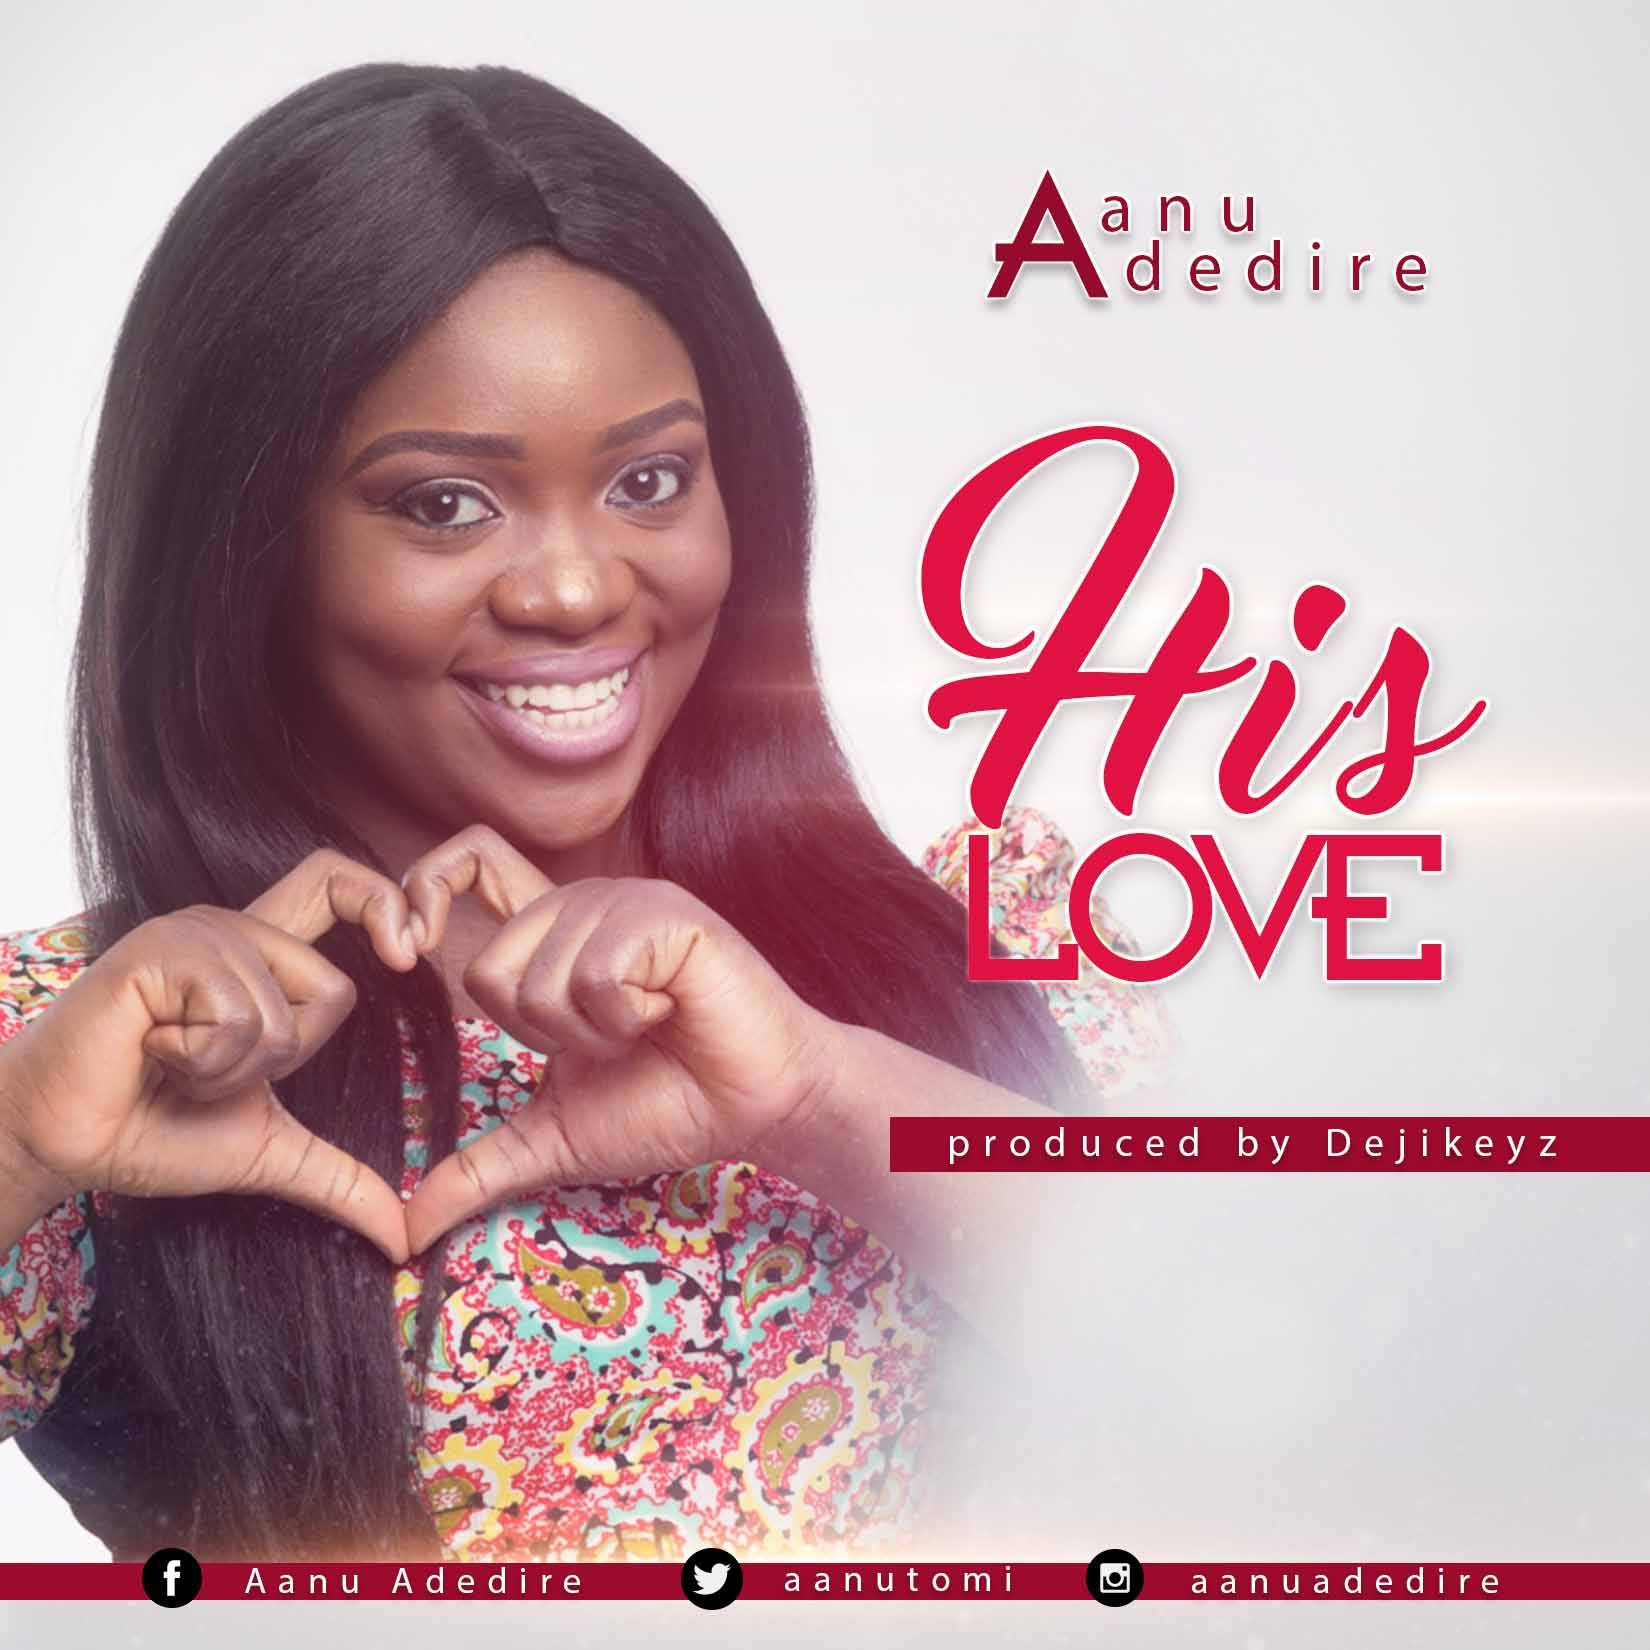 Aanu Adedire - his love